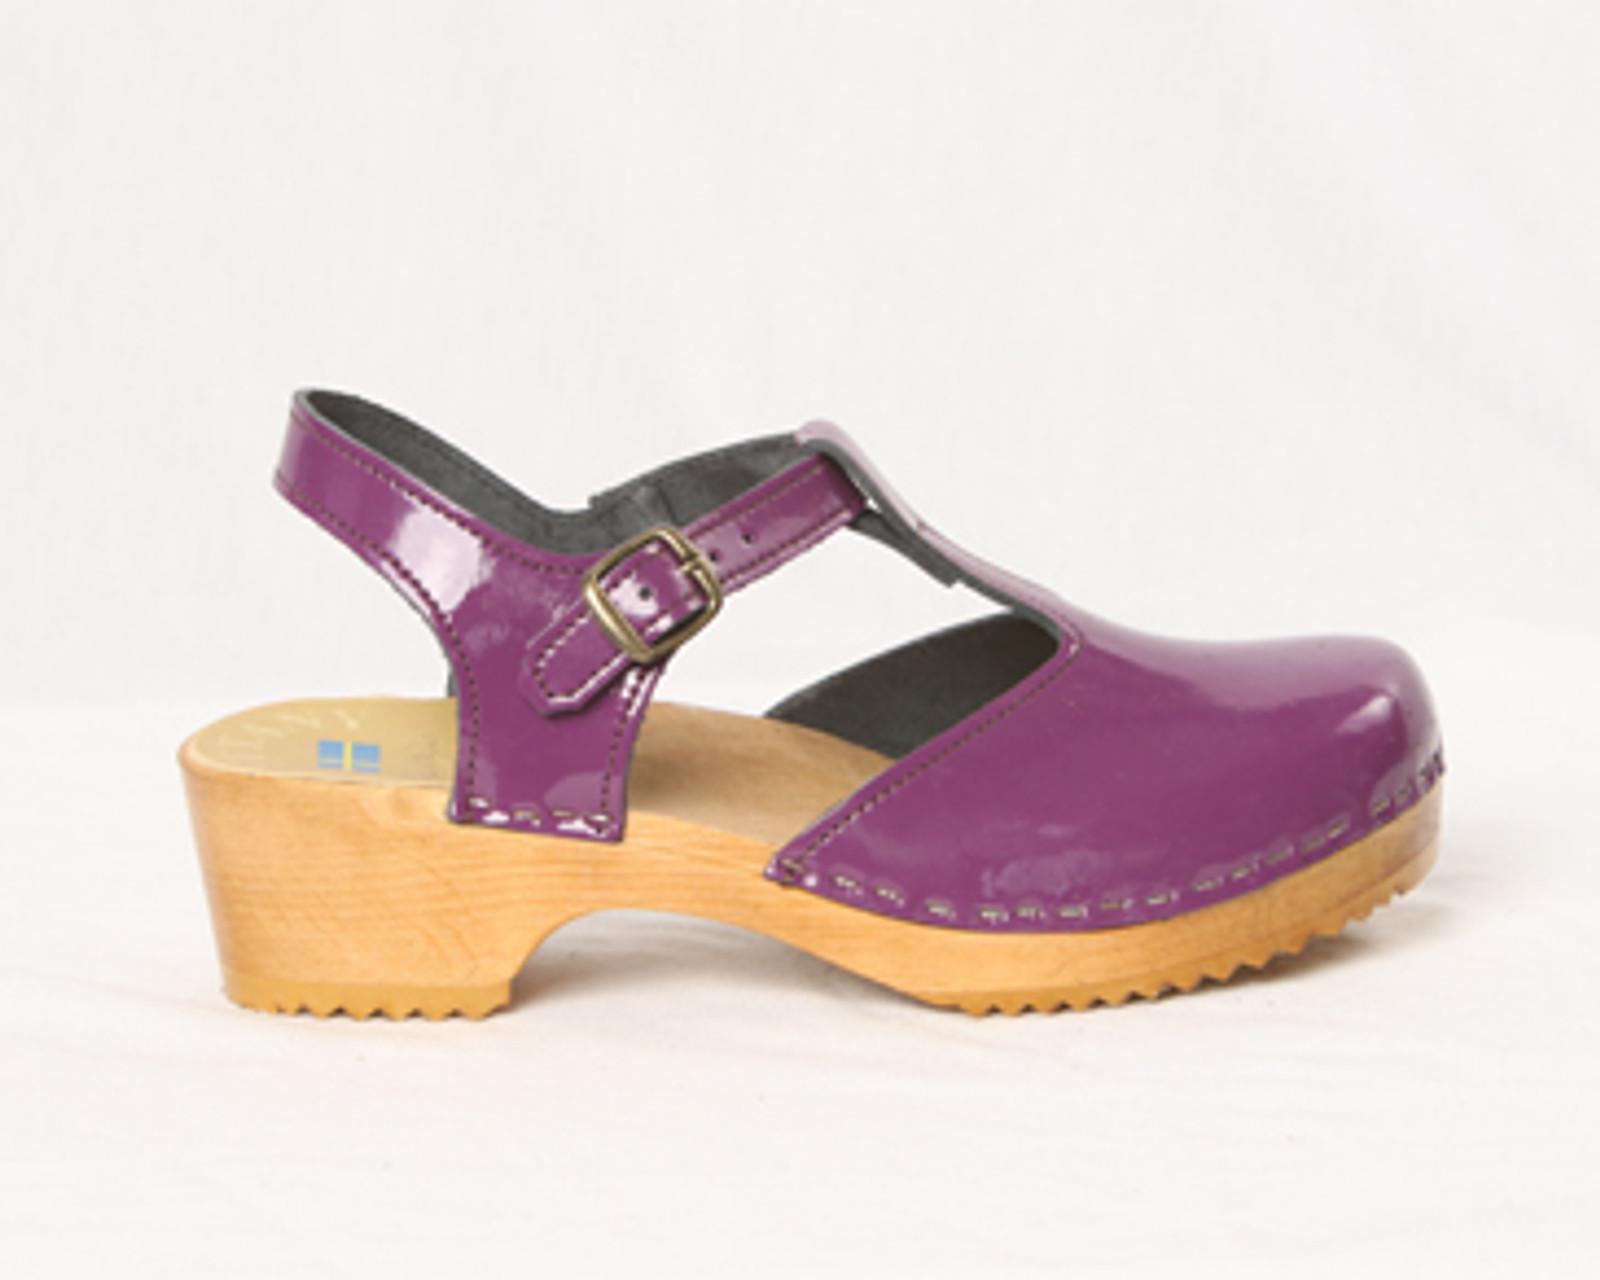 T-Straps - Low Heel - Swedish Clogs